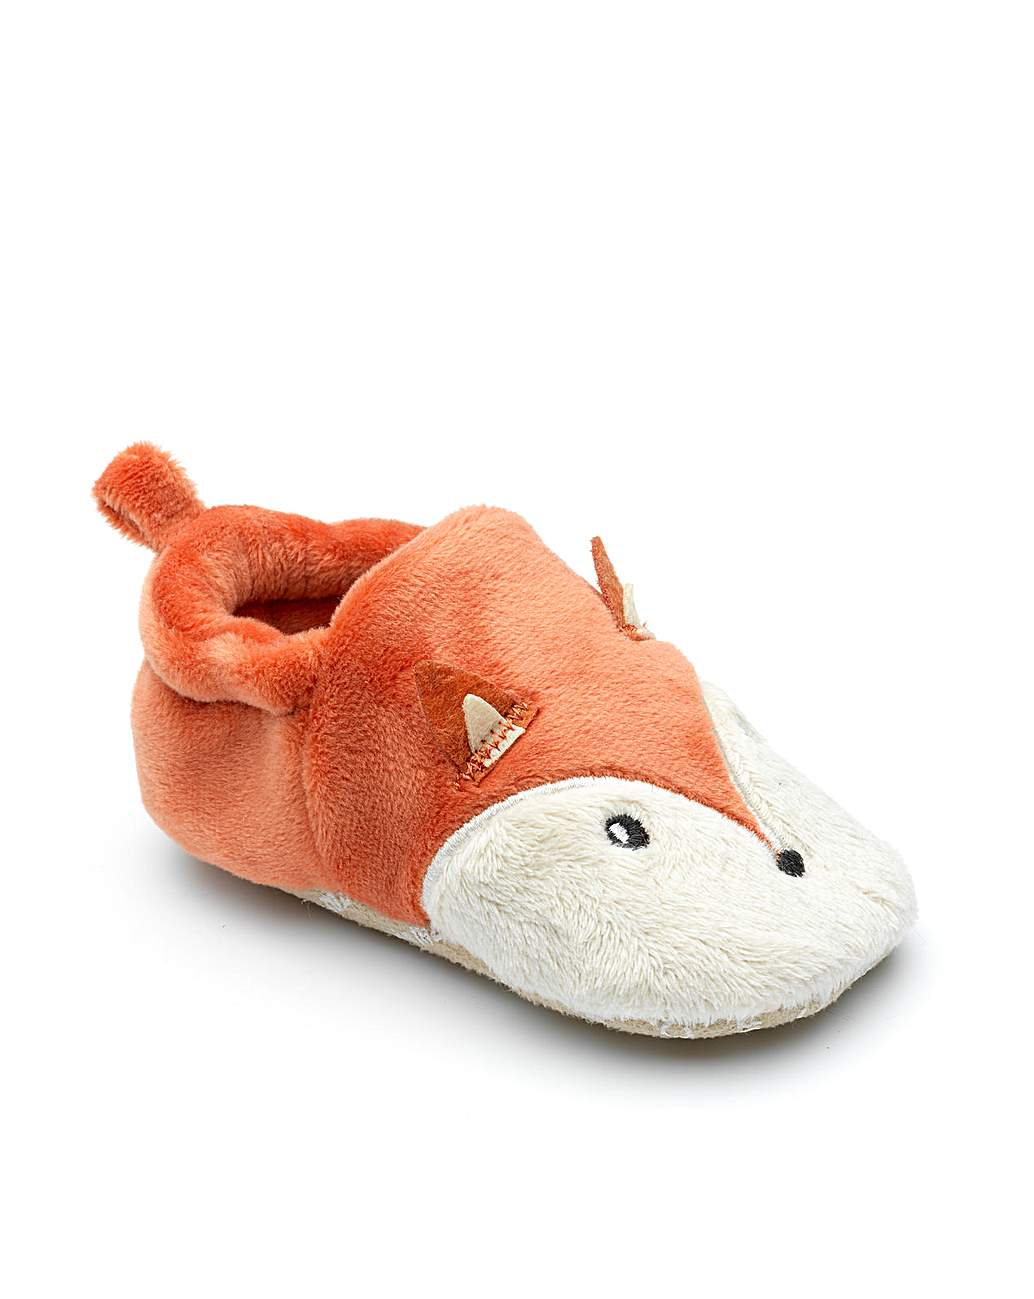 Chipmunks rust fox slipper